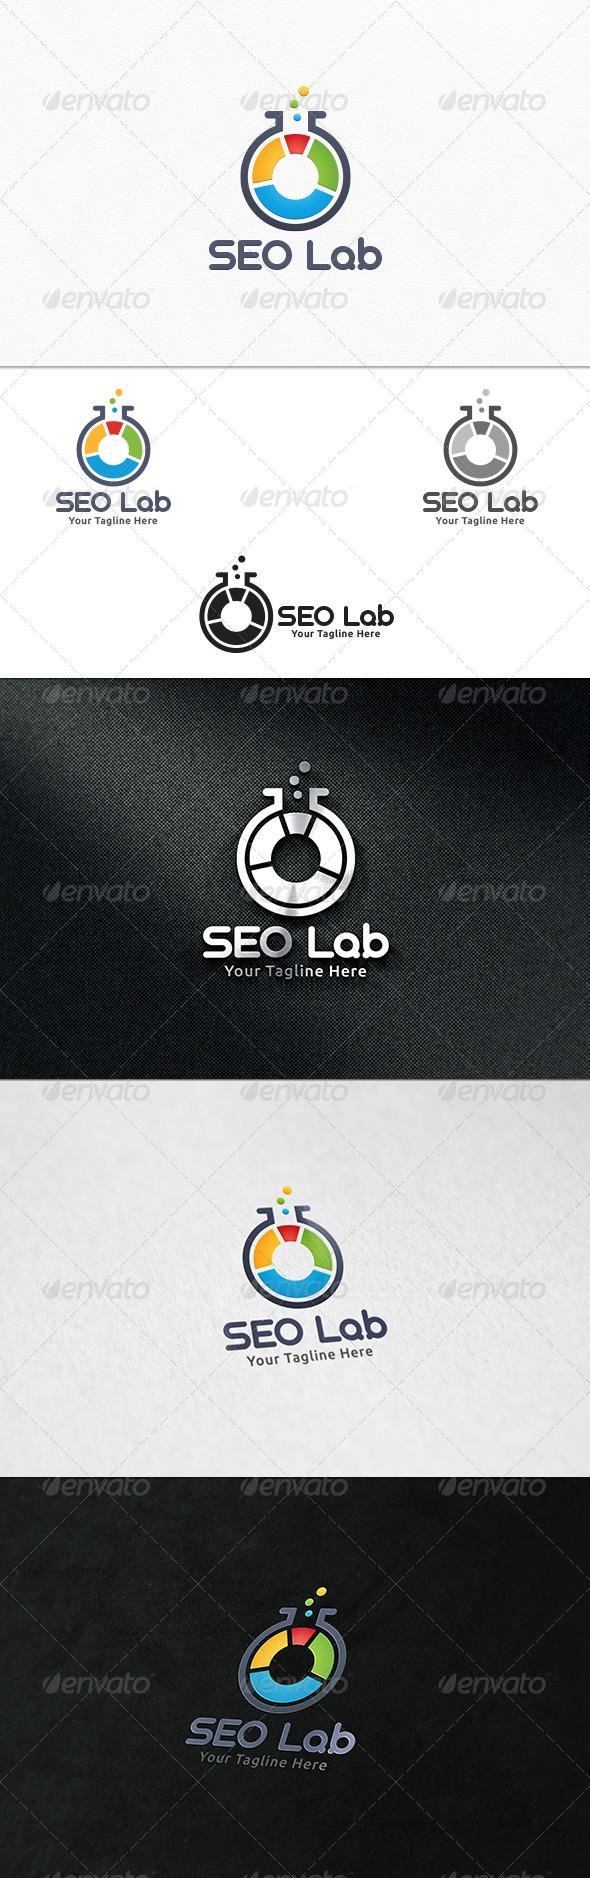 GraphicRiver SEO Lab Logo Template 7548524